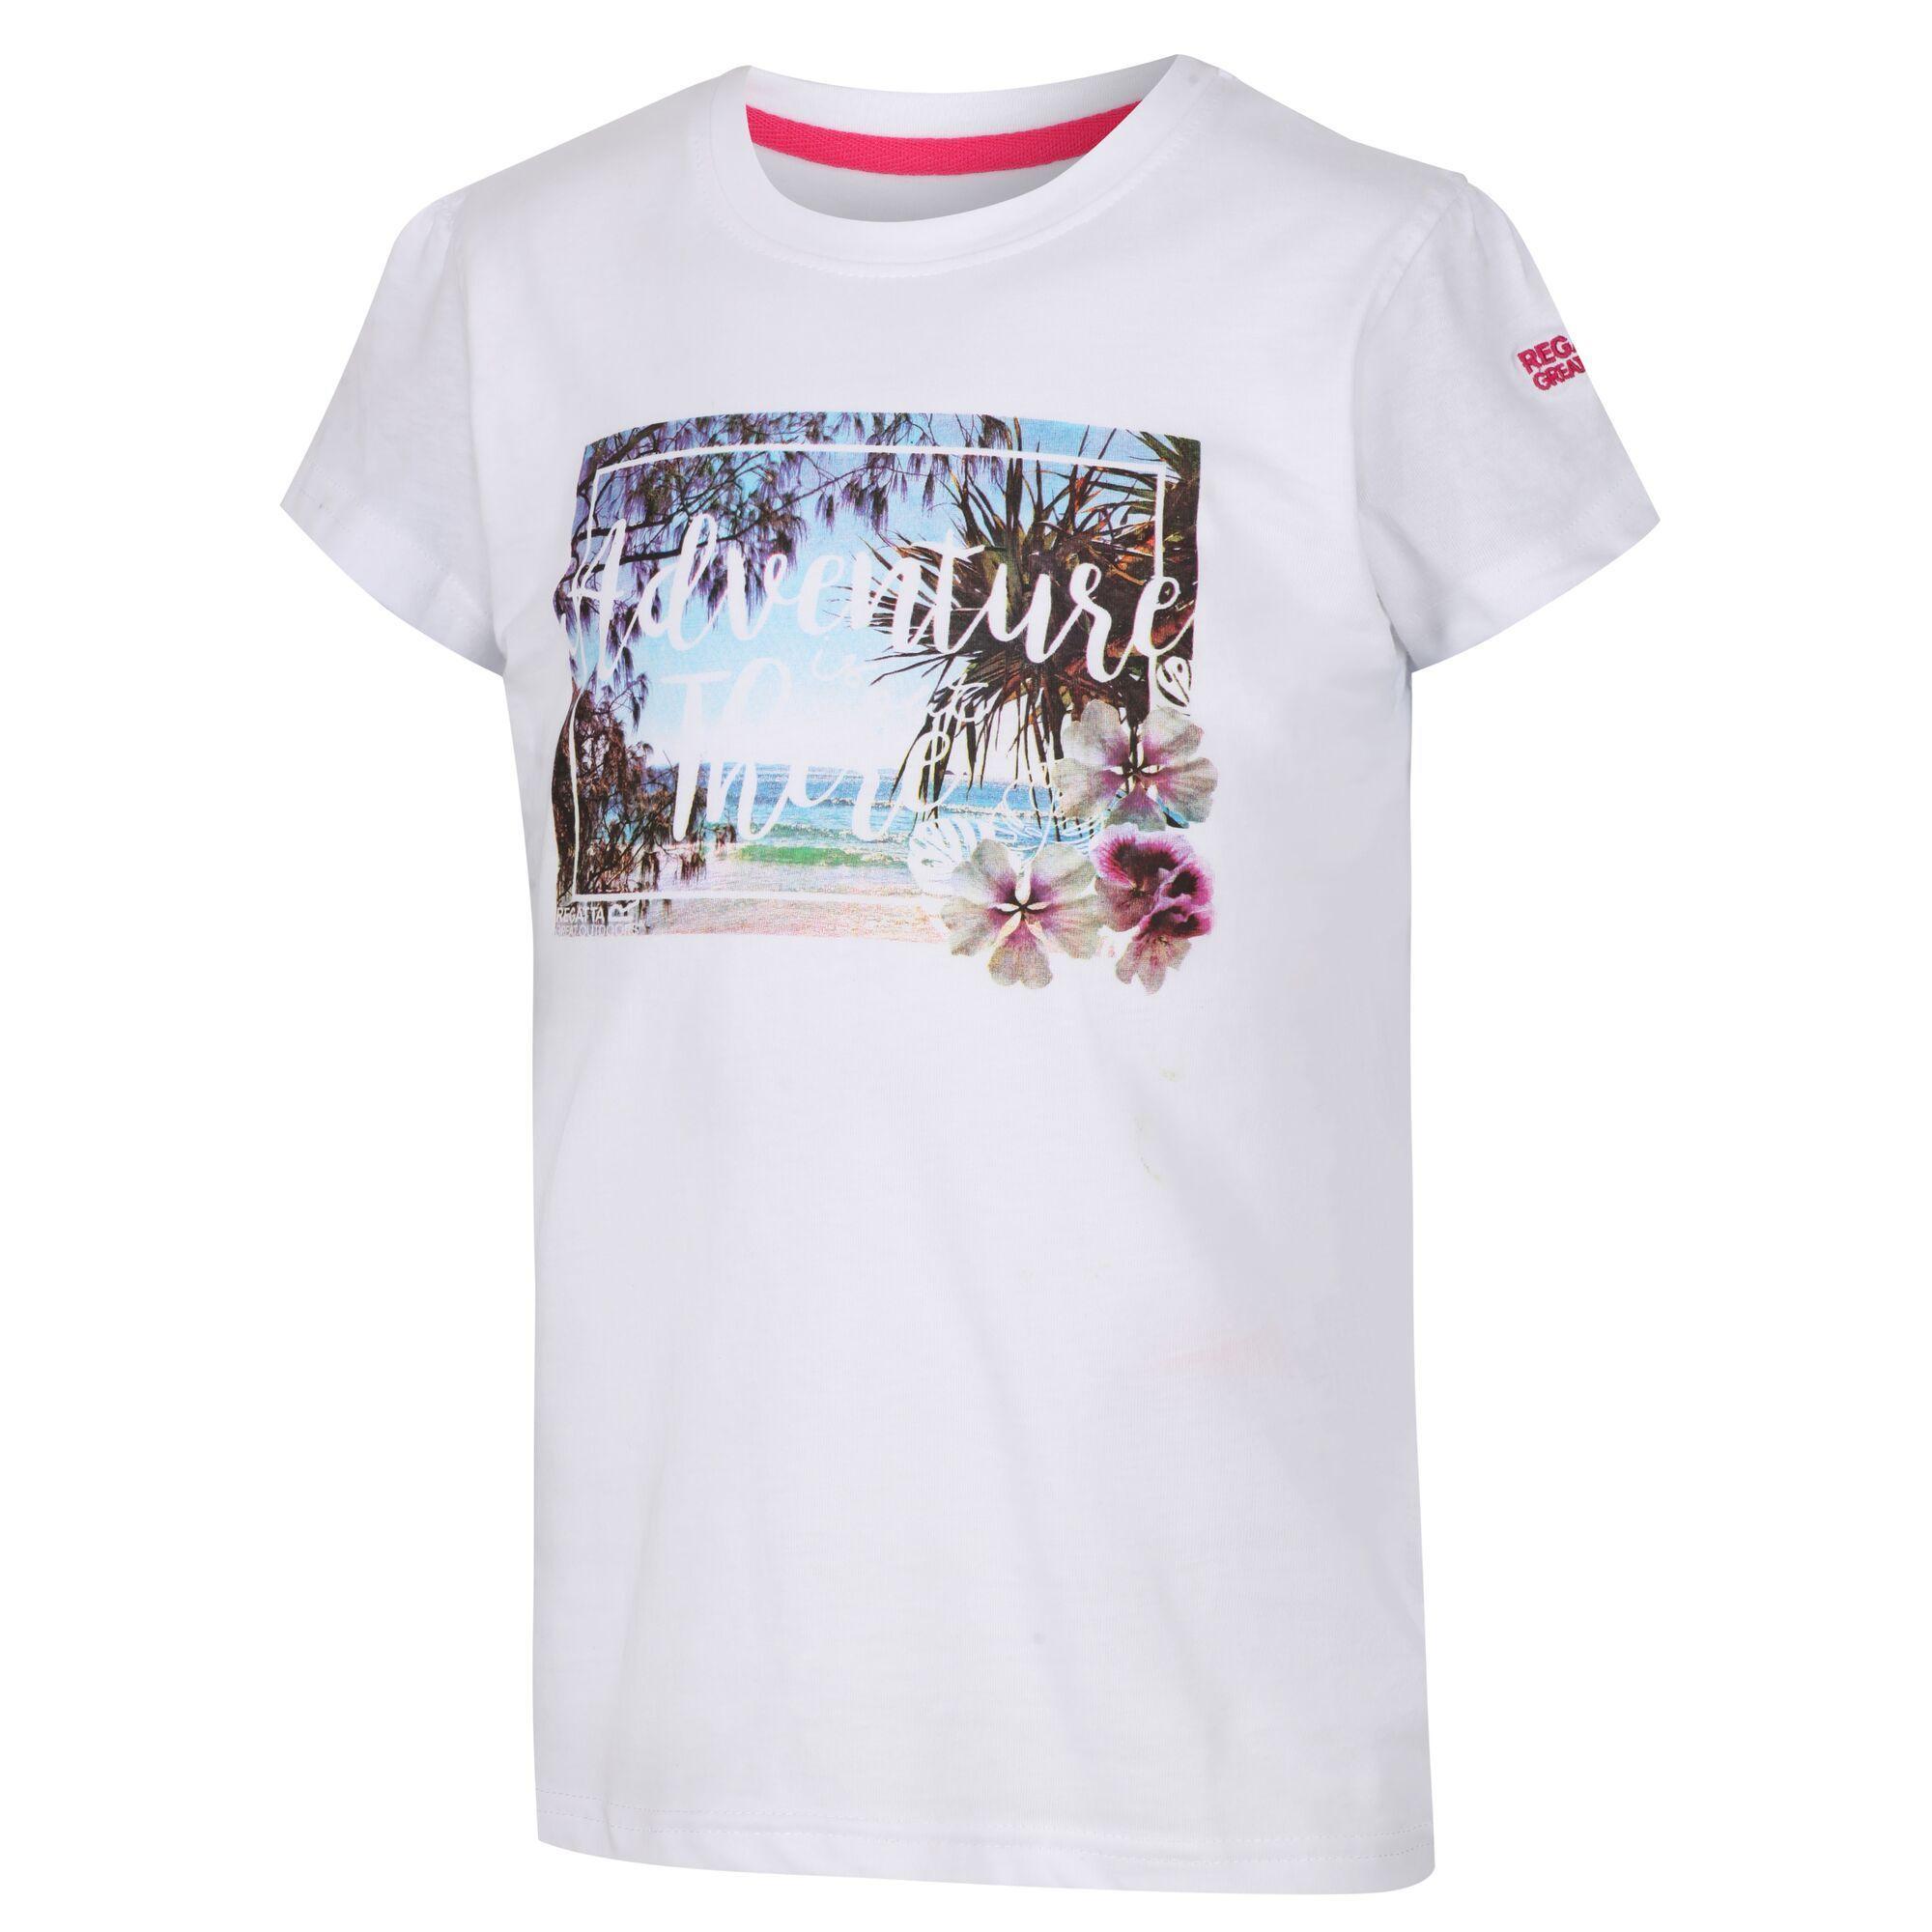 Regatta Childrens/Kids Bosley II Graphic Print T-Shirt